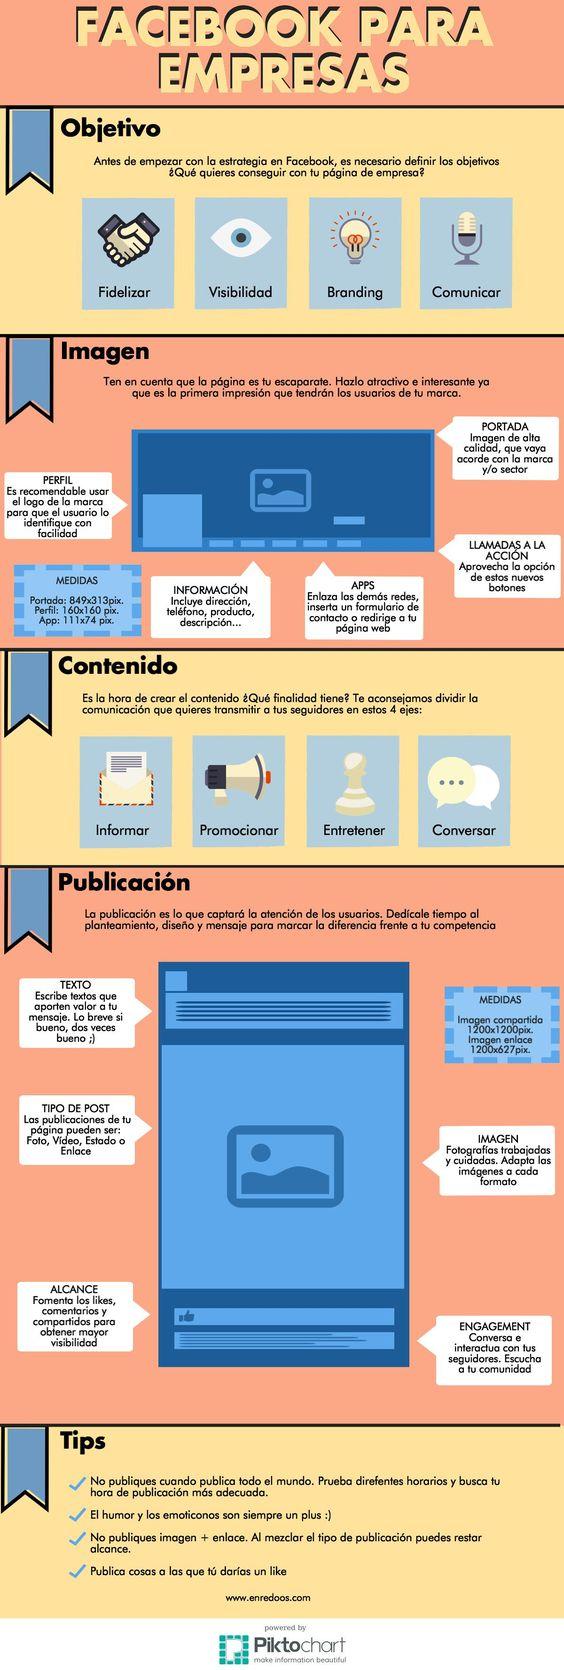 consejos-facebook-para-empresas-infografia